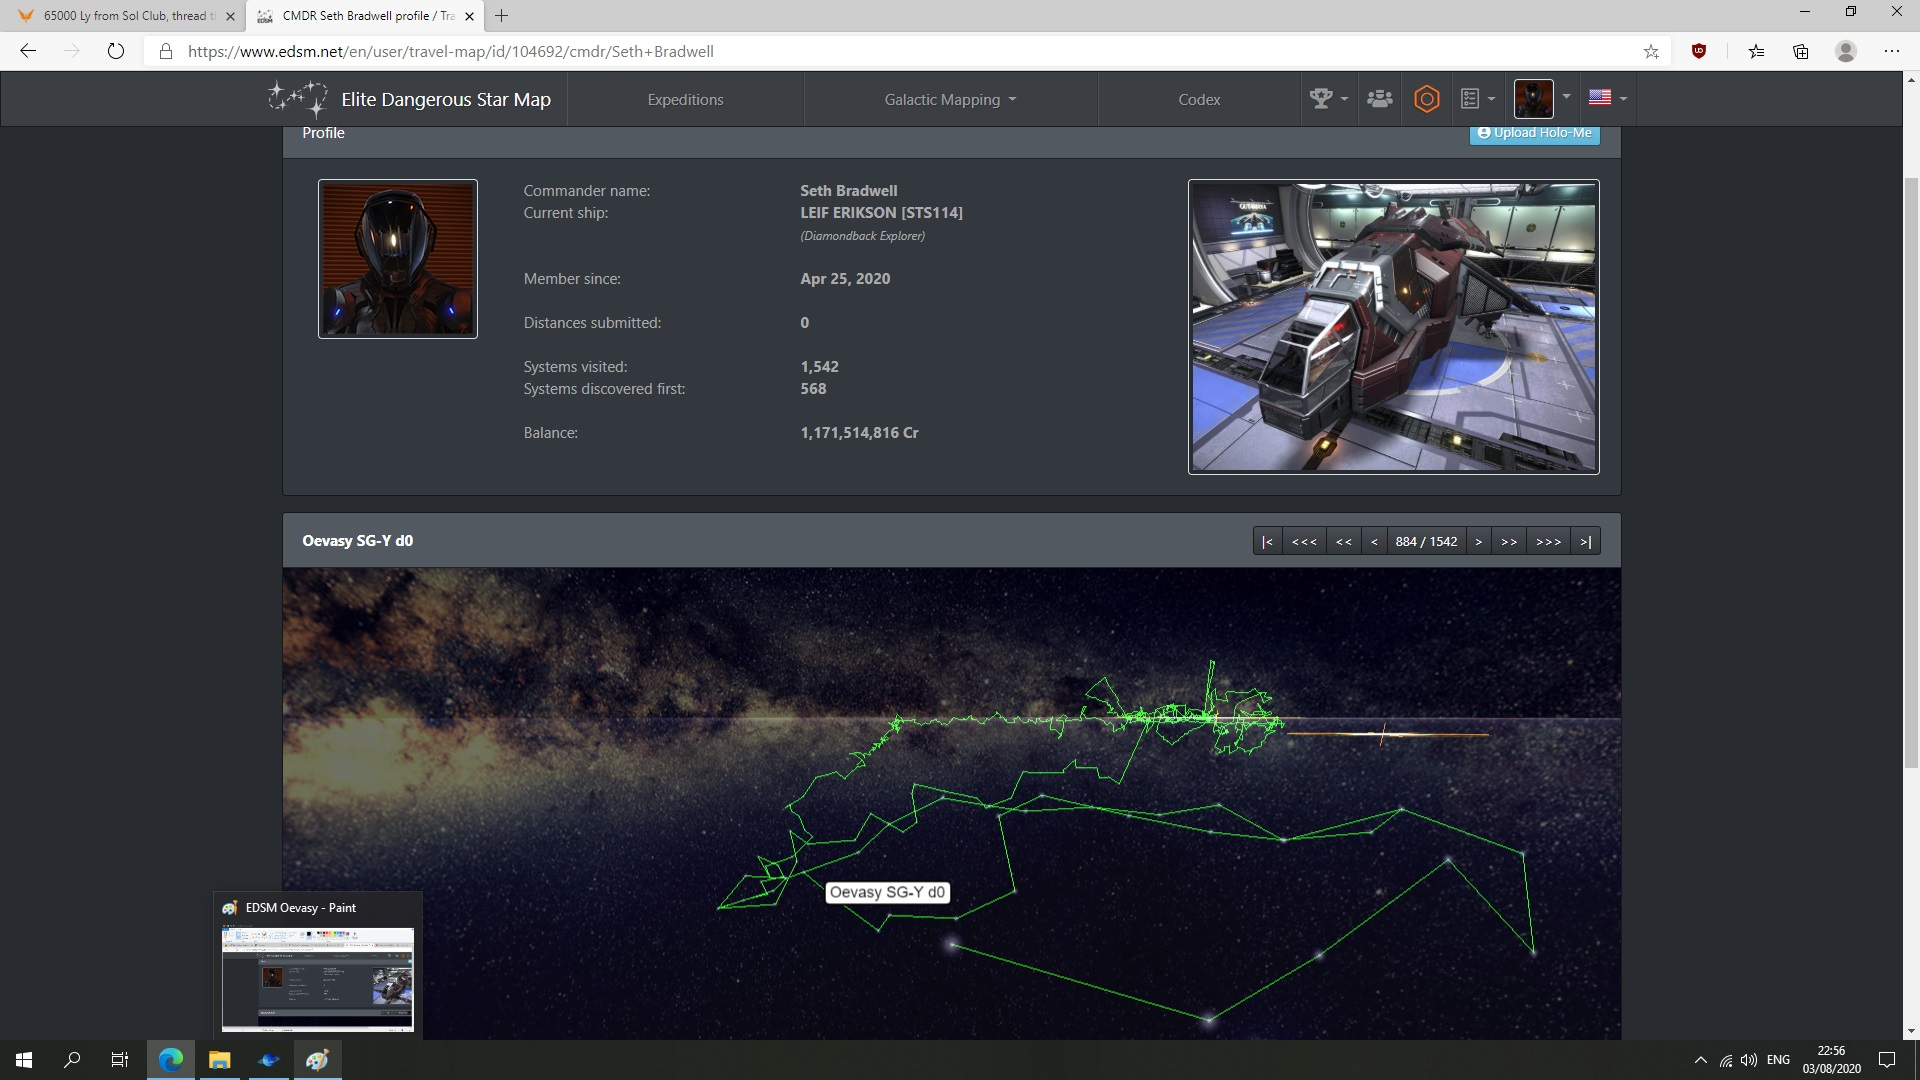 EDSM Oevasy Screenshot.jpg